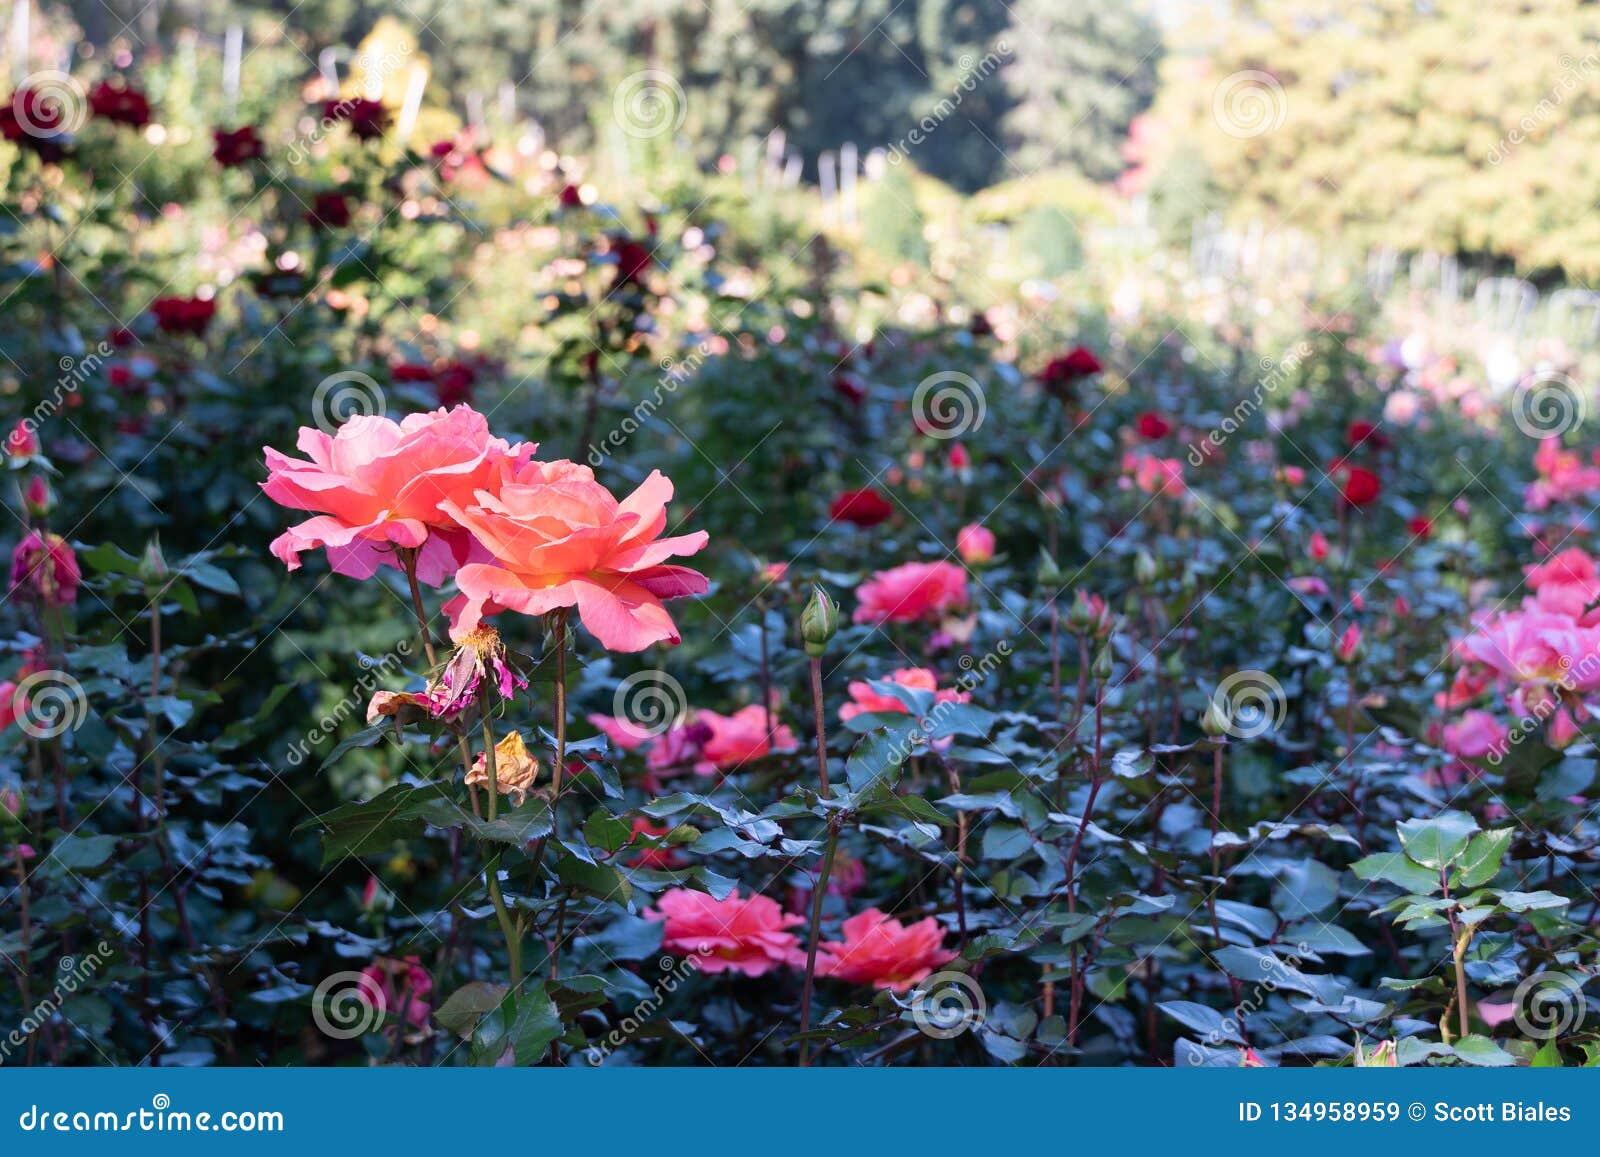 Portland Rose Garden Stock Image Image Of Drops Plants 134958959